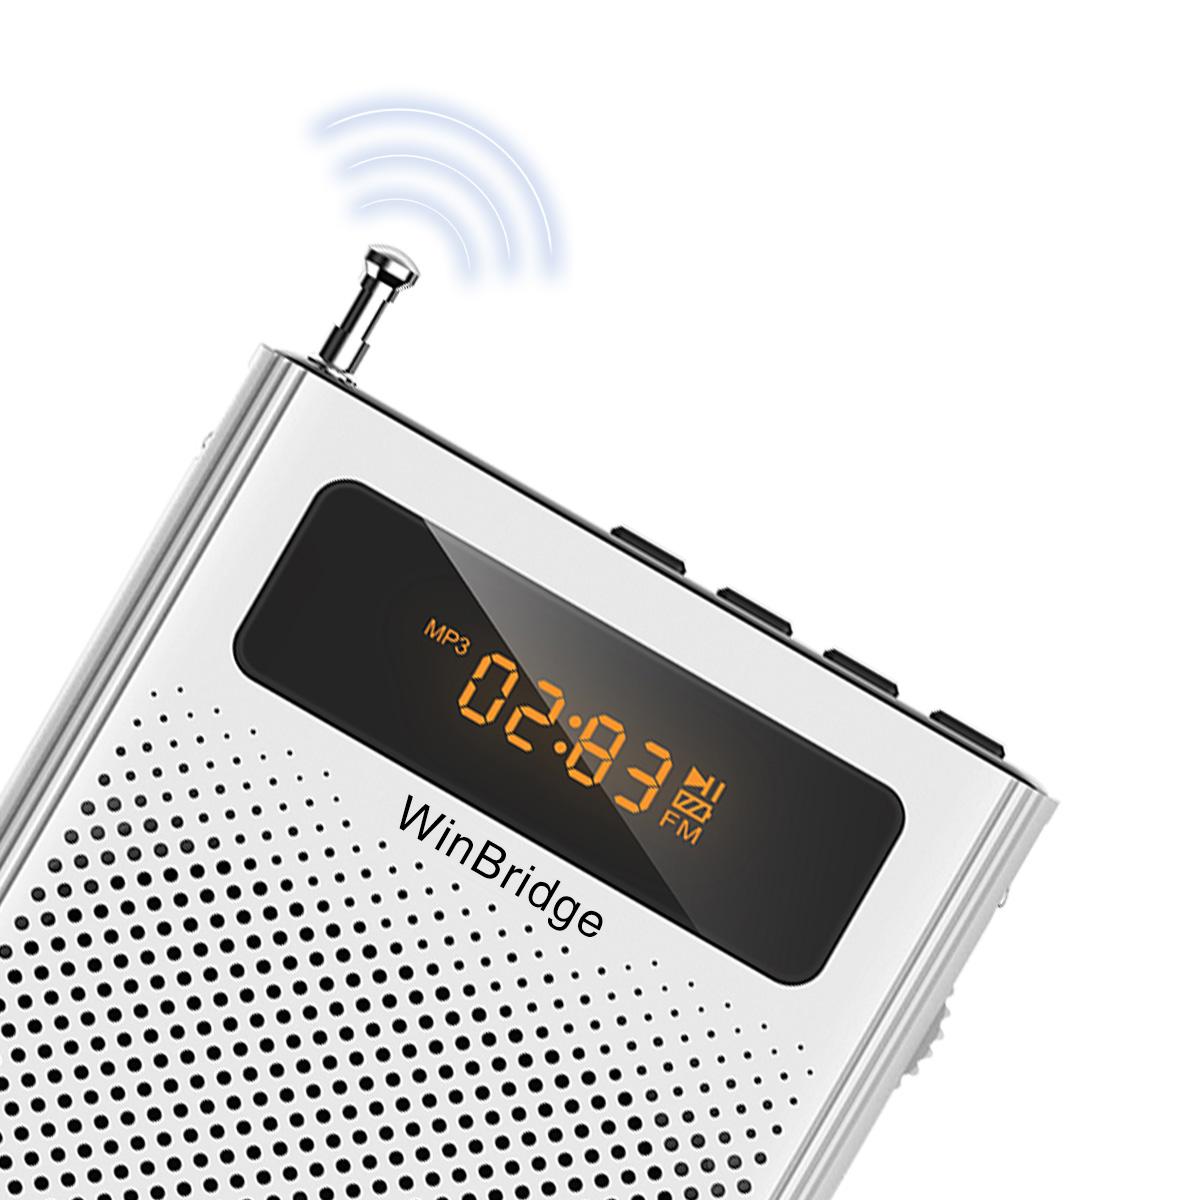 Winbridge winbridge voice amplifier factory for sale-13